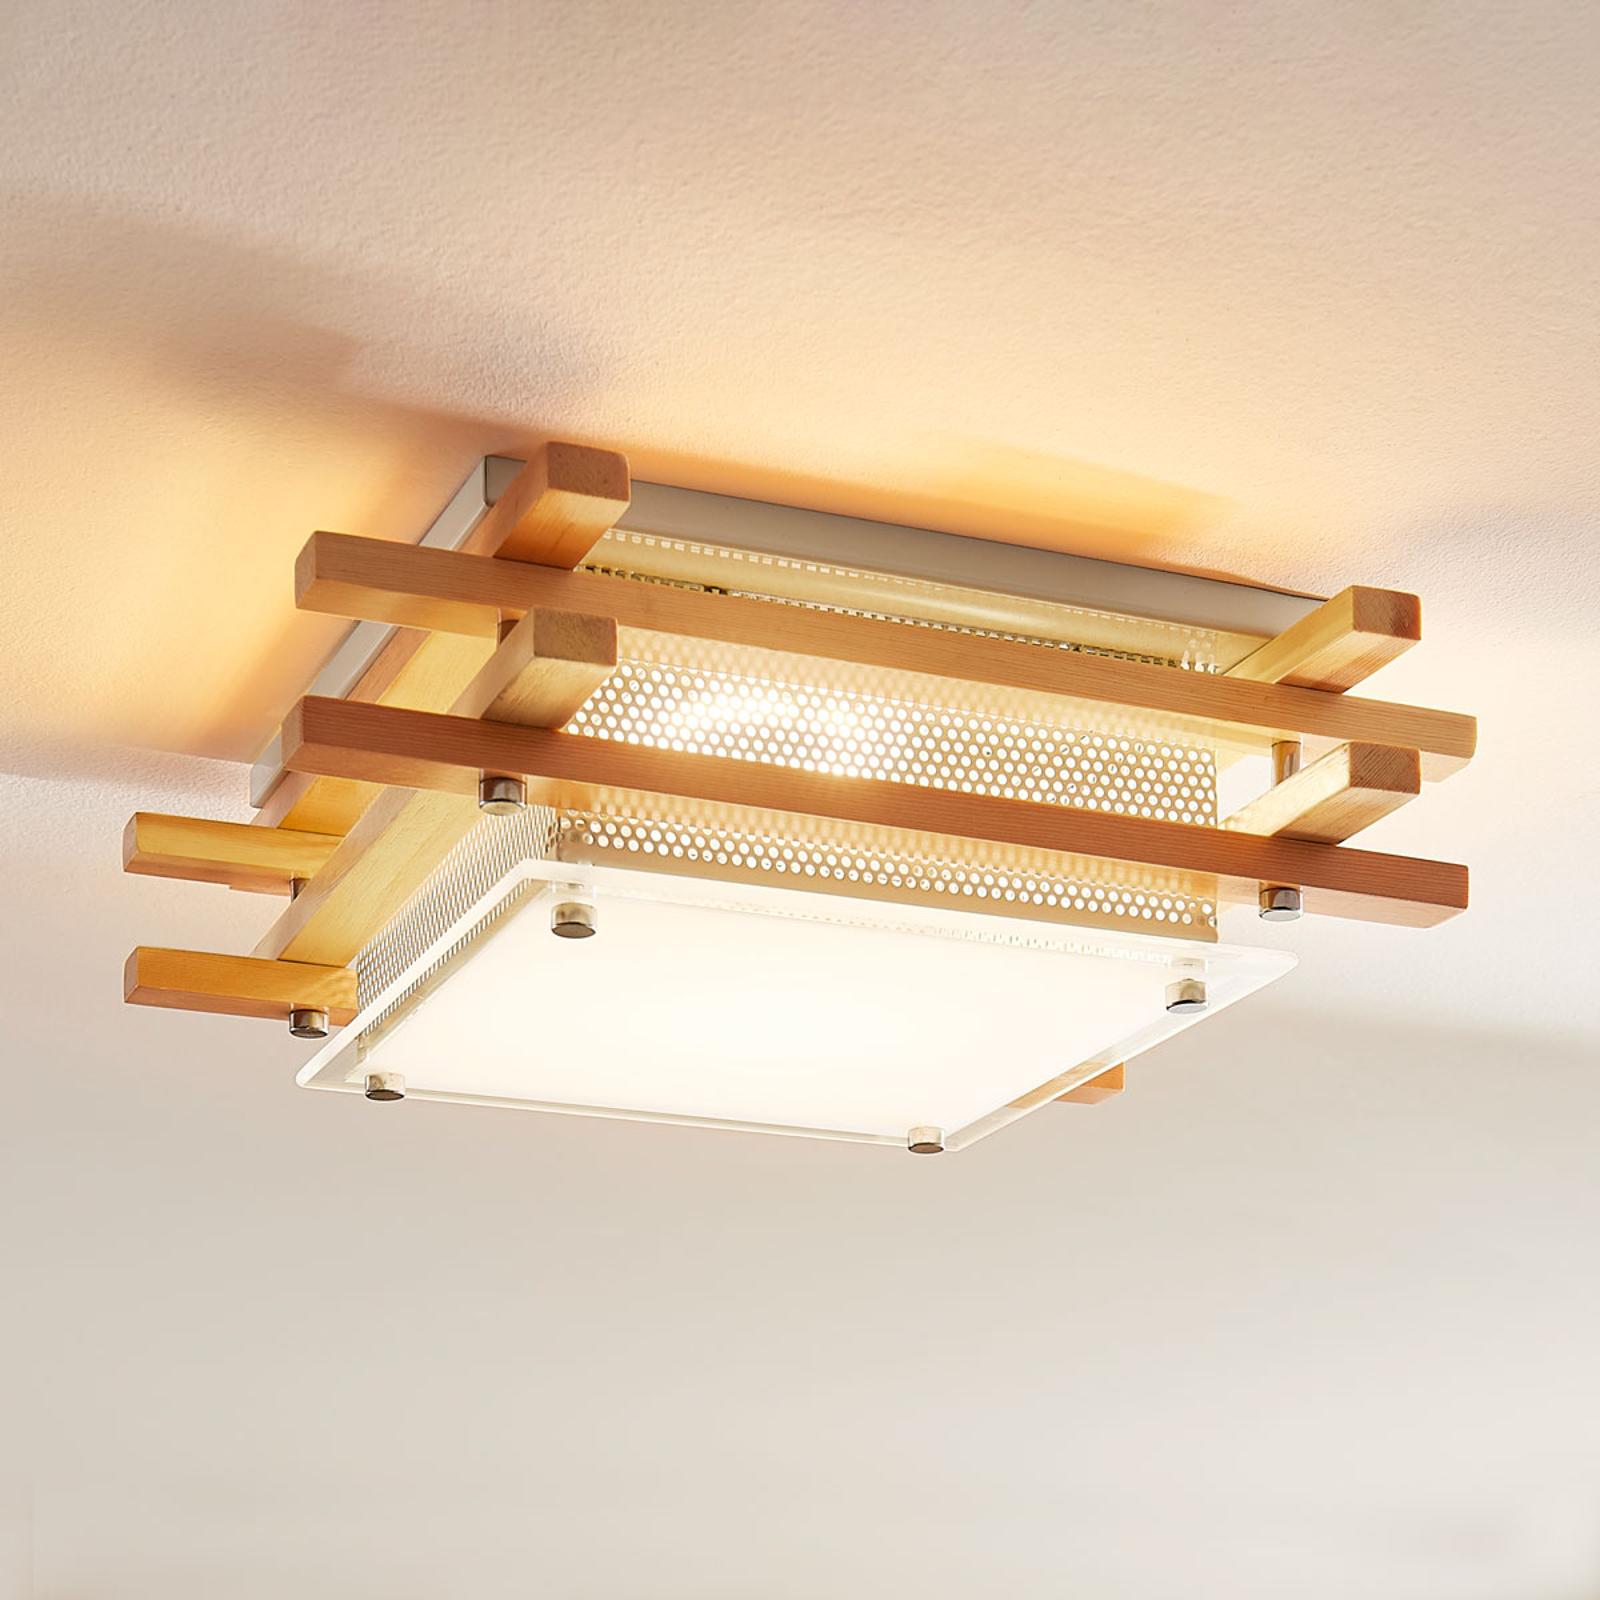 Hoekige houten LED plafondlamp Zuna, dimbaar